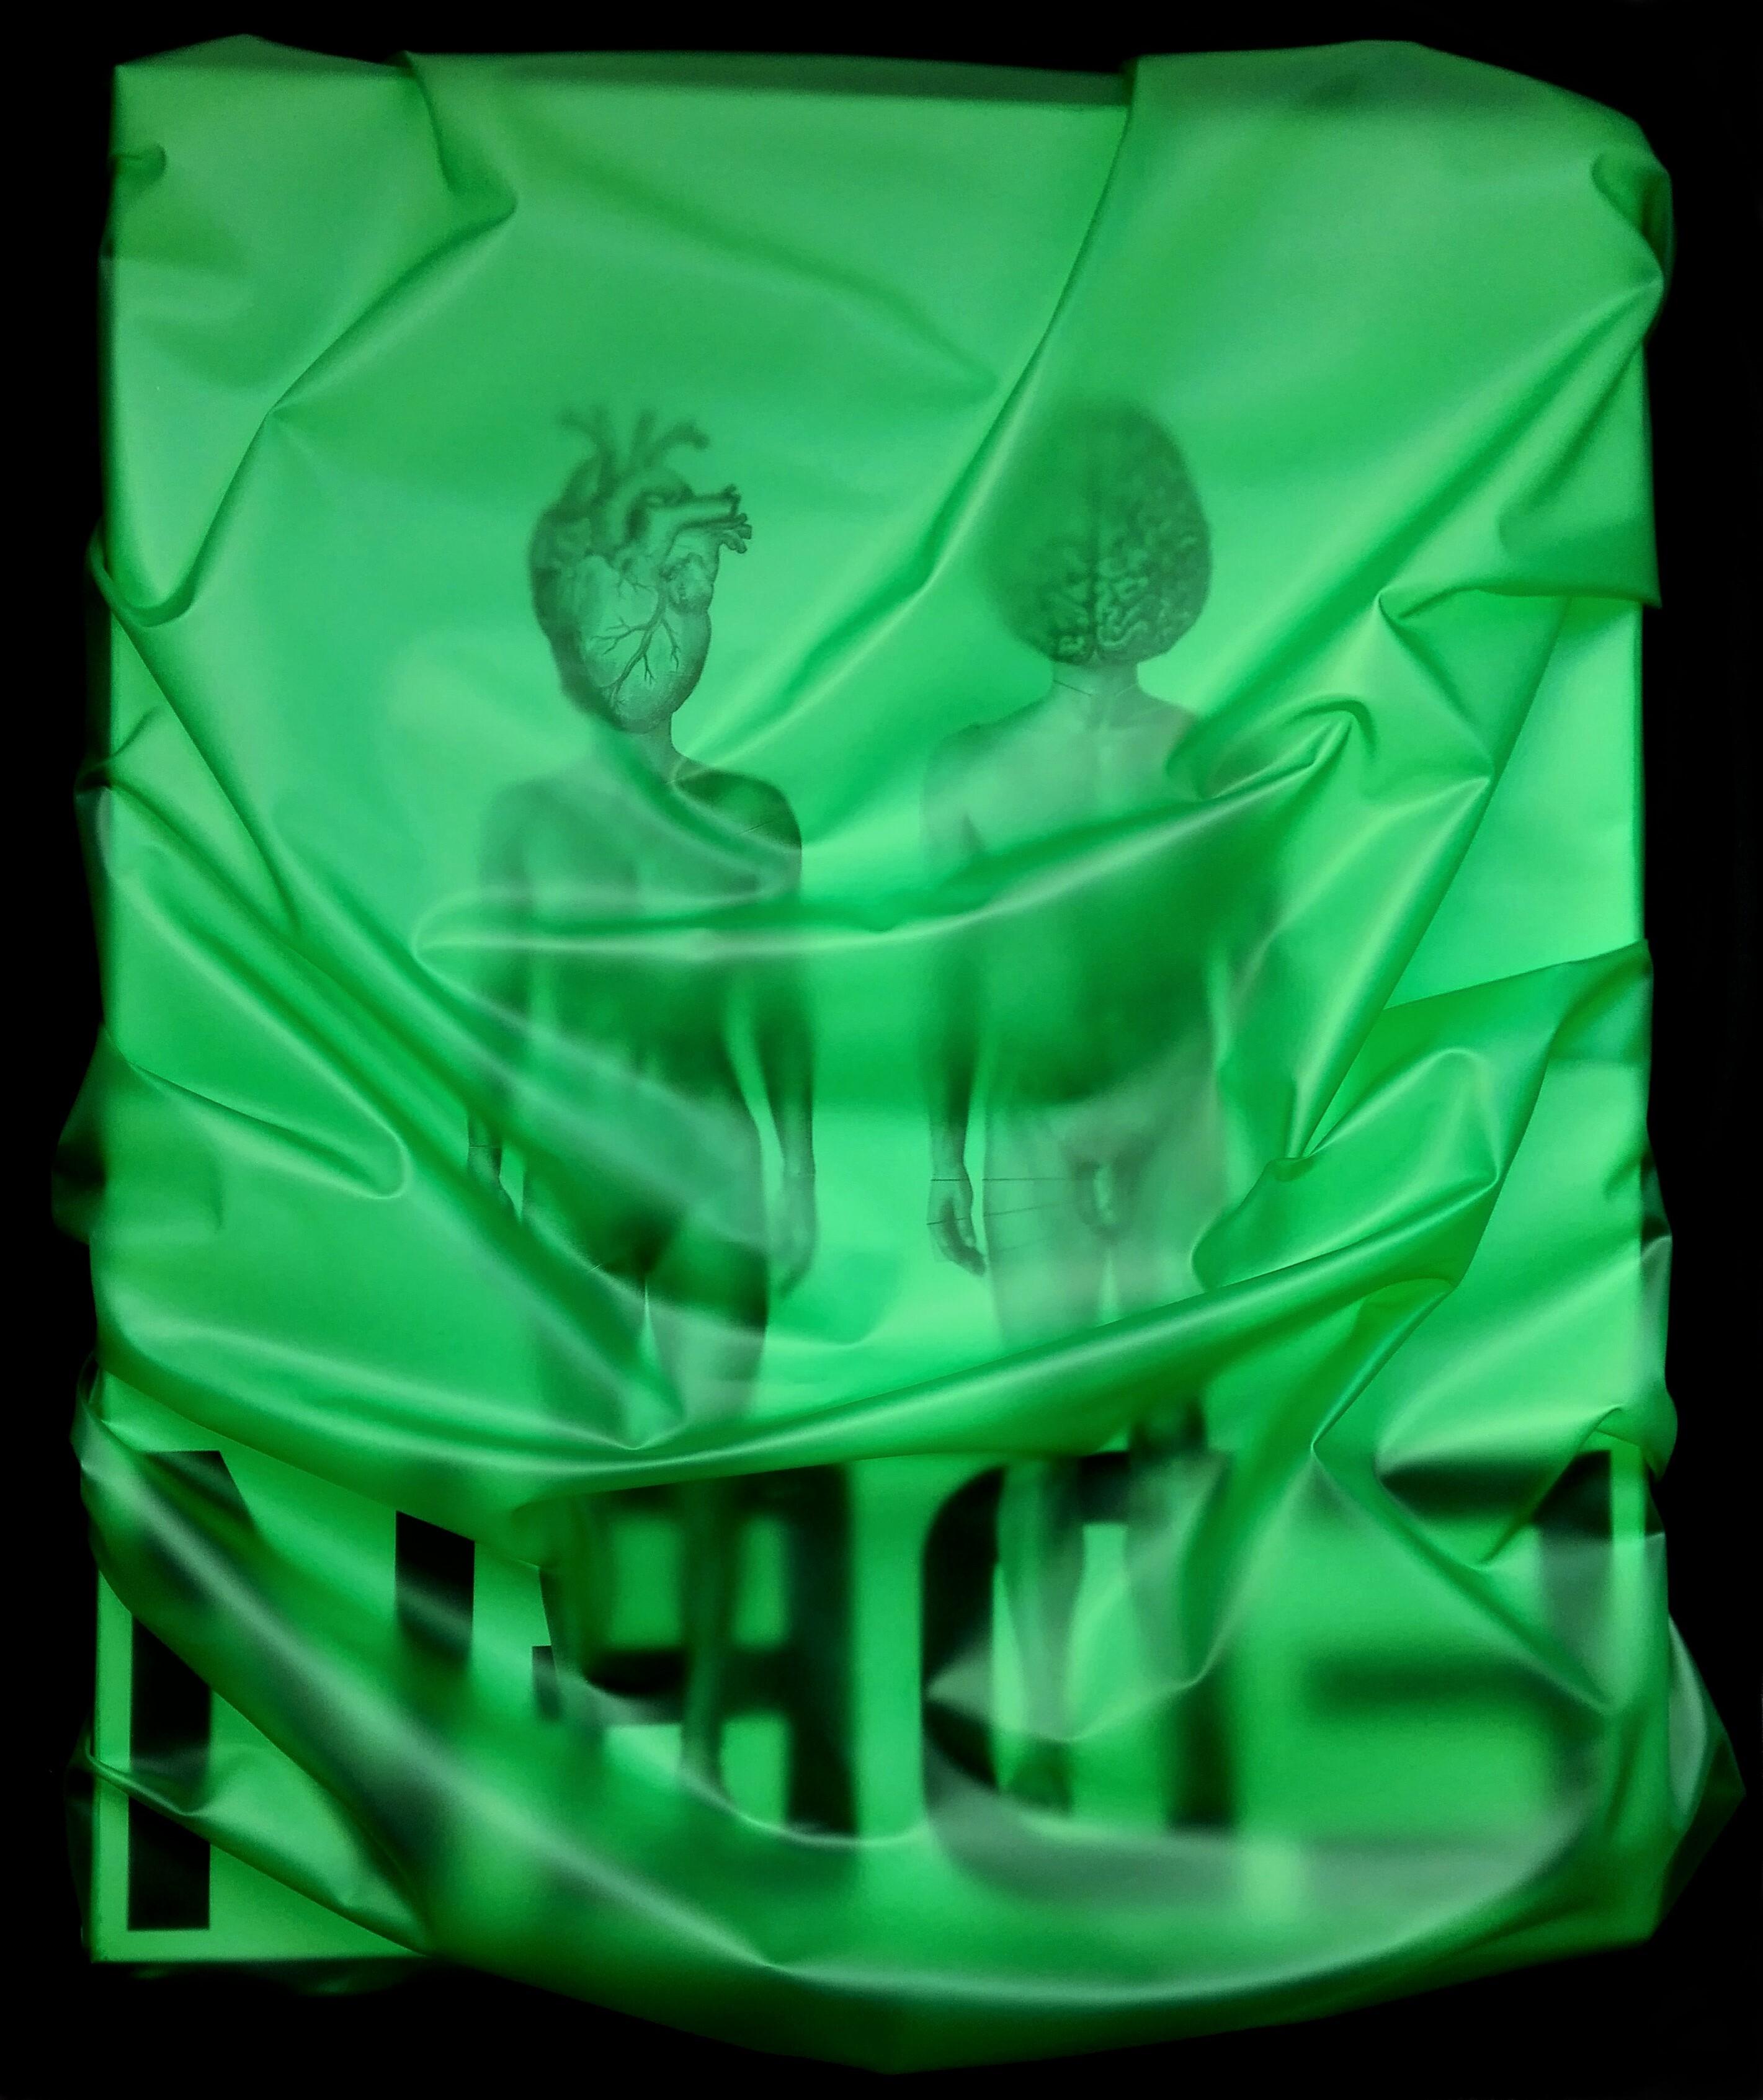 "newton air ""eden has fallen"", 2018, folie, acryl, papier auf leinwand, 125 x 108 x 18 cm"